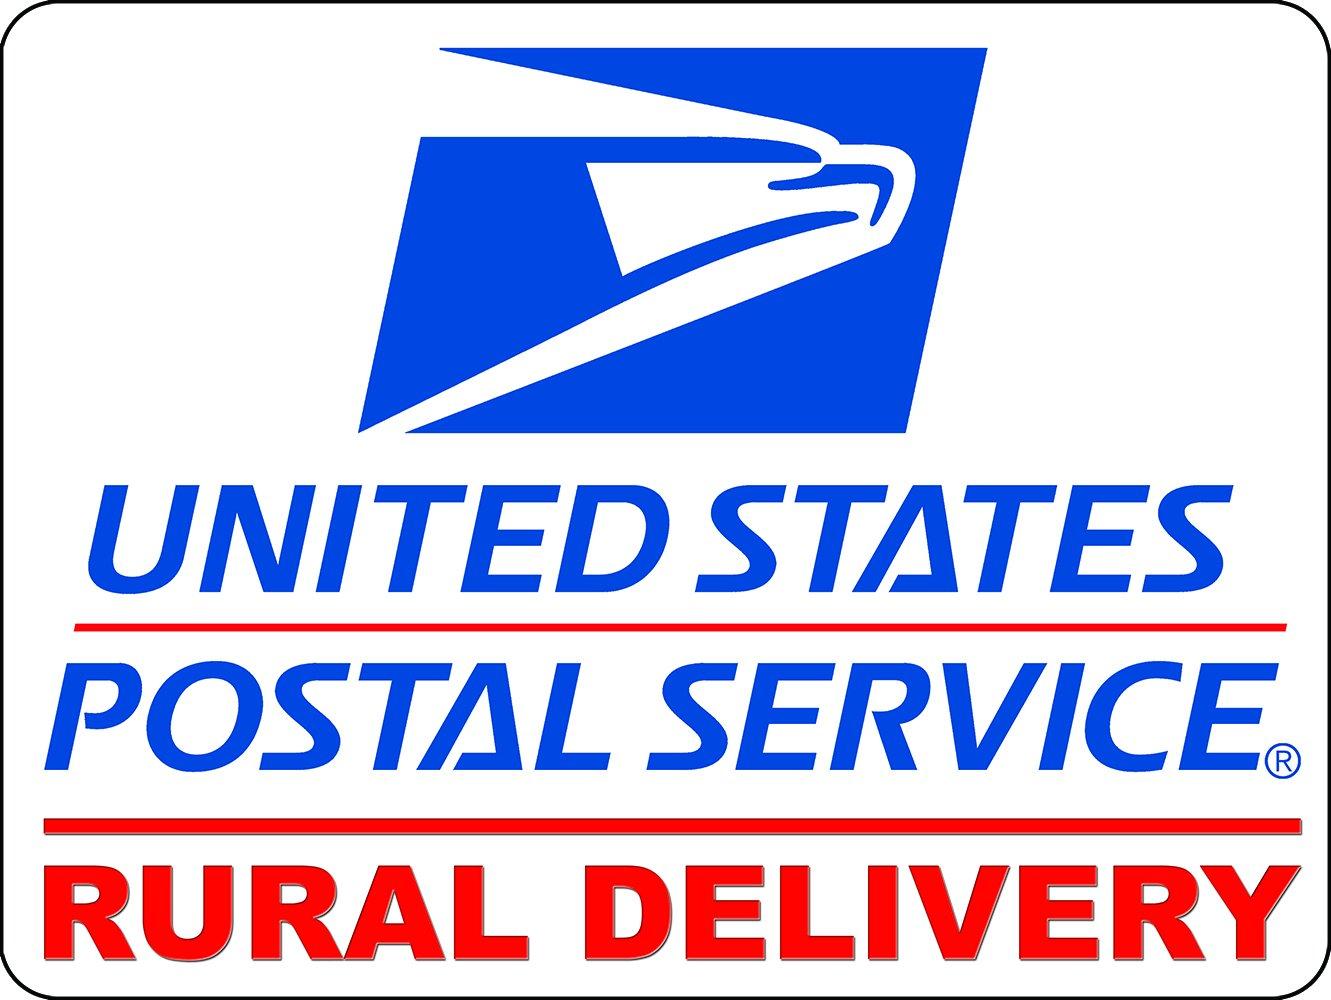 Amazon us mail rural delivery magnetic car sign 9x12 amazon us mail rural delivery magnetic car sign 9x12 automotive buycottarizona